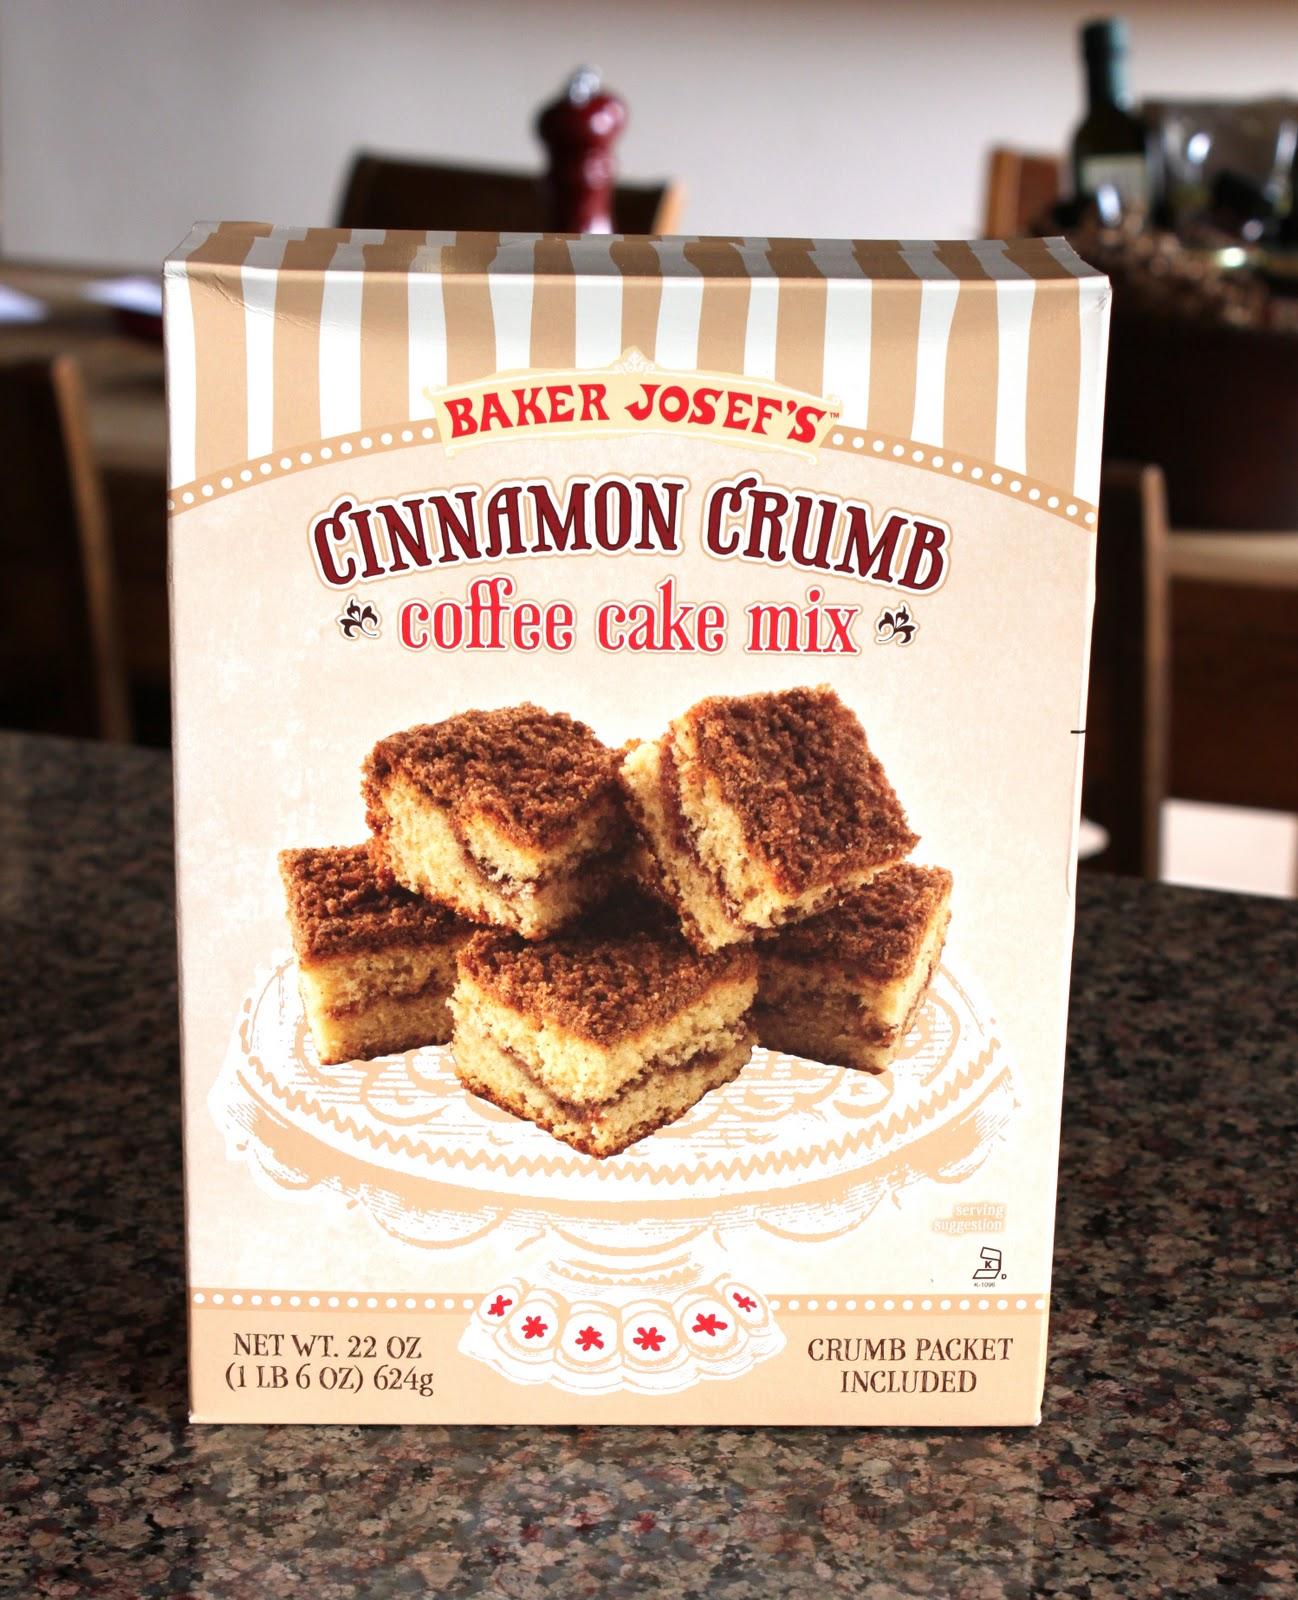 Sand Art Cake Mix : Virginia Bailey - Art Inspired: June 2013